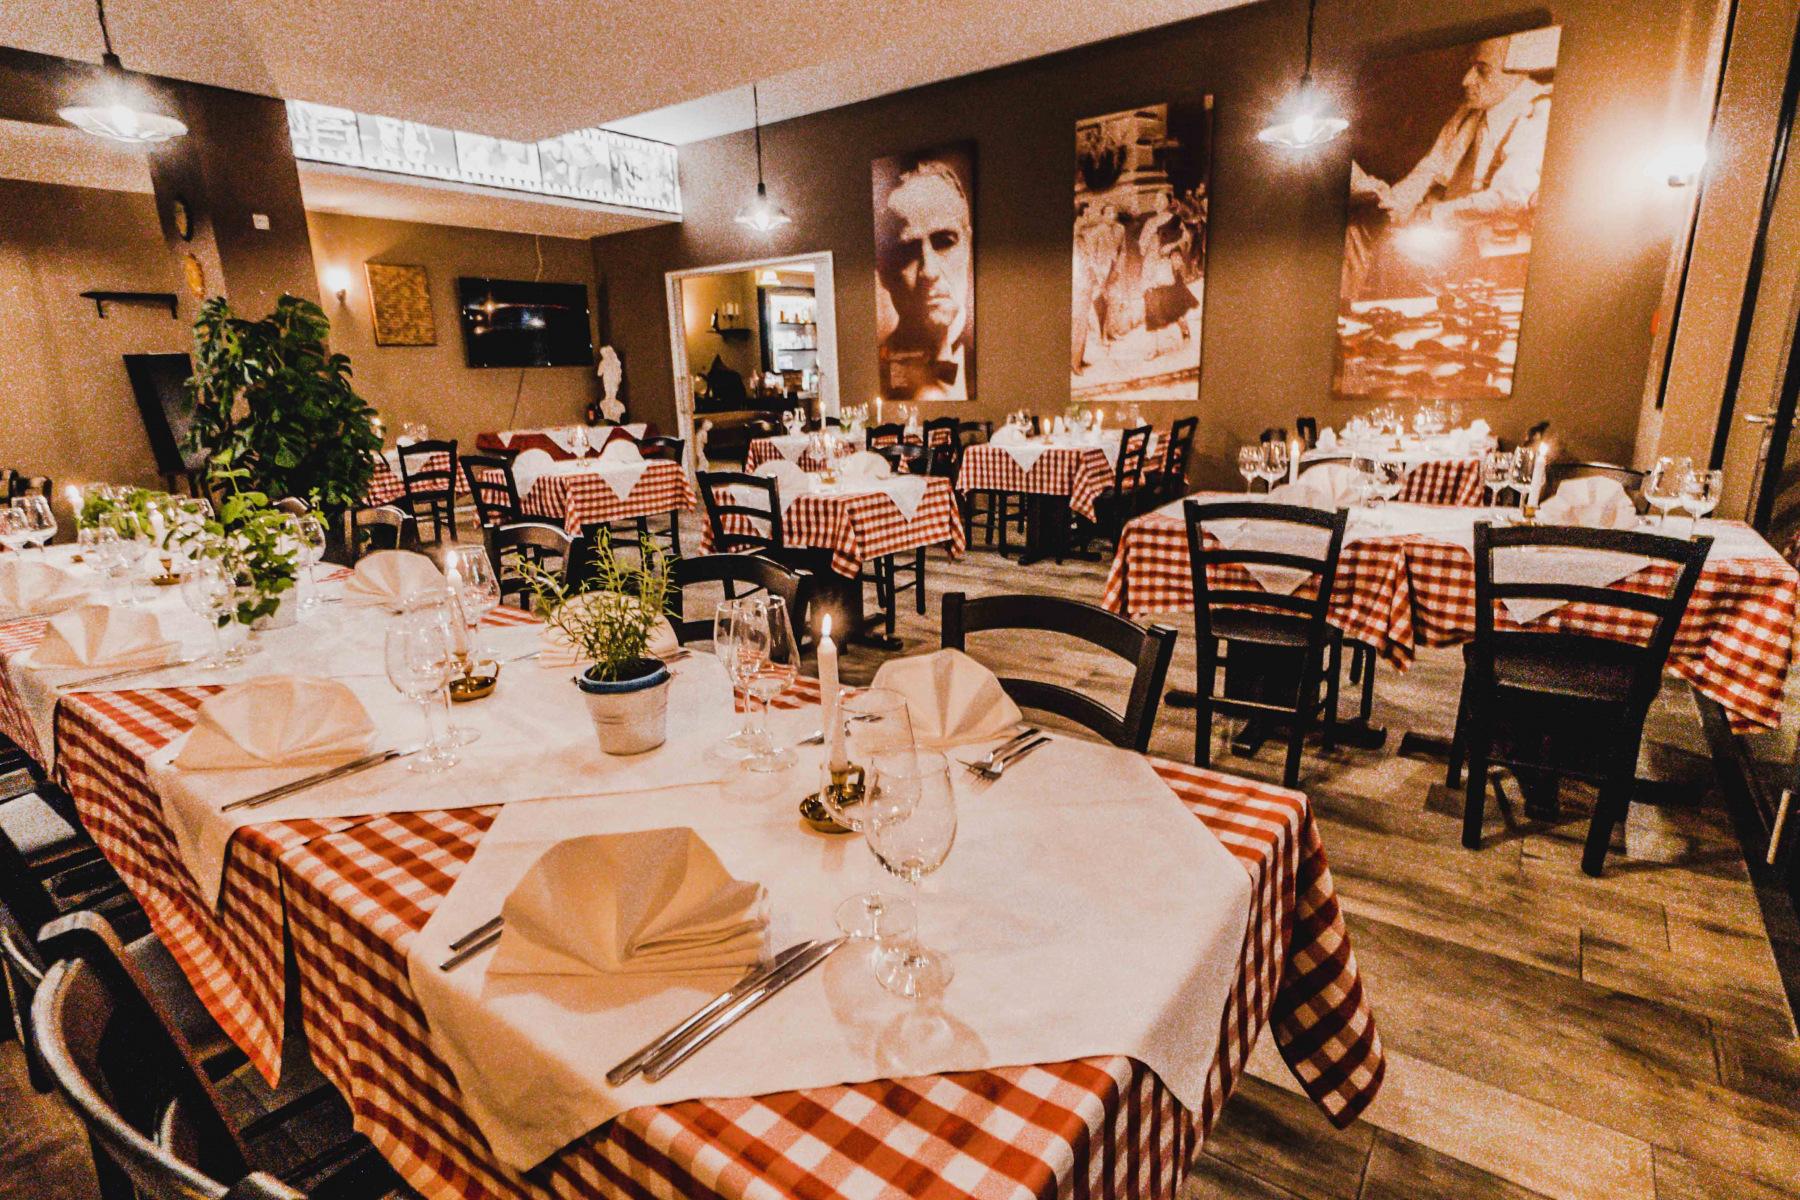 Pizzeria_Osteria_Siciliana_Nebenraum-3